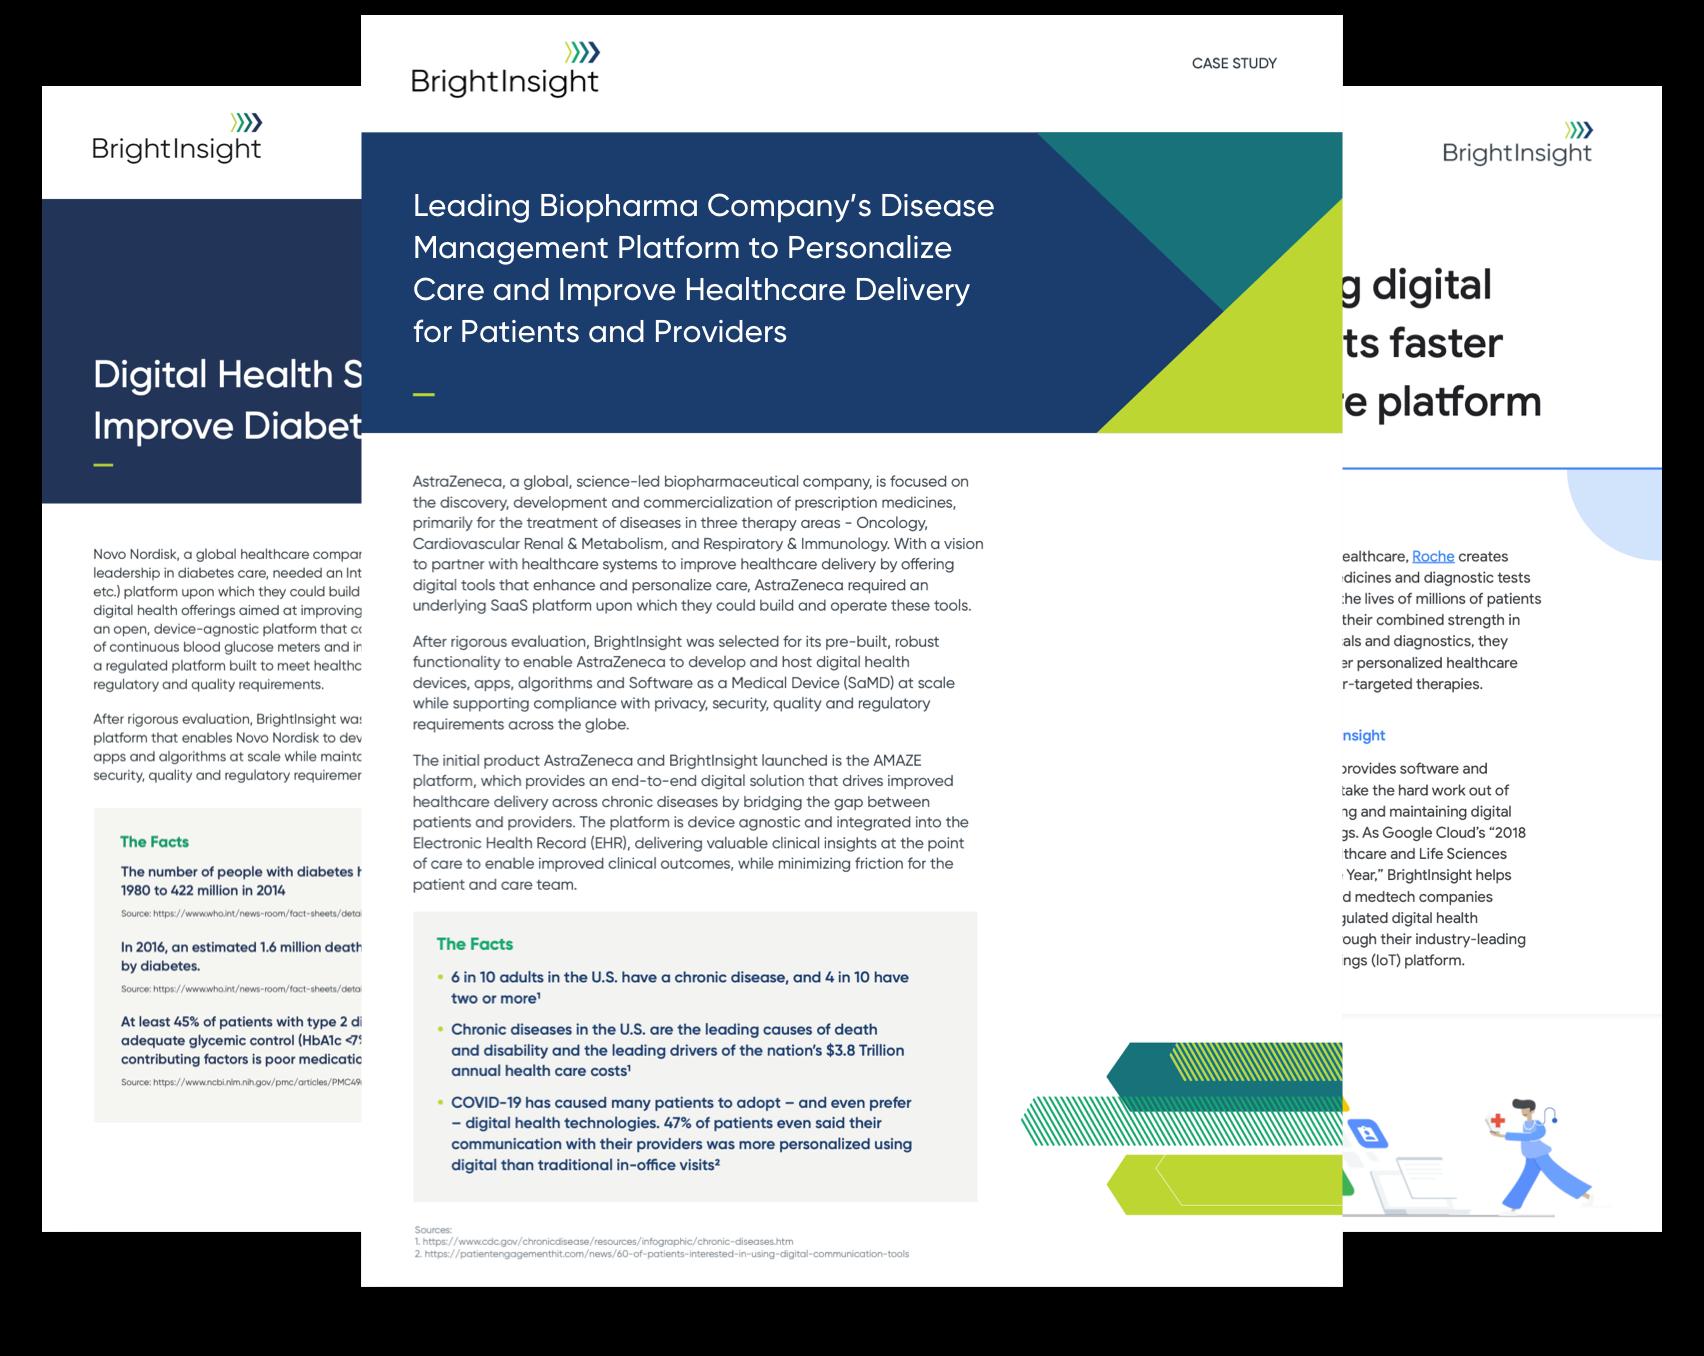 Proven trusted platform case studies